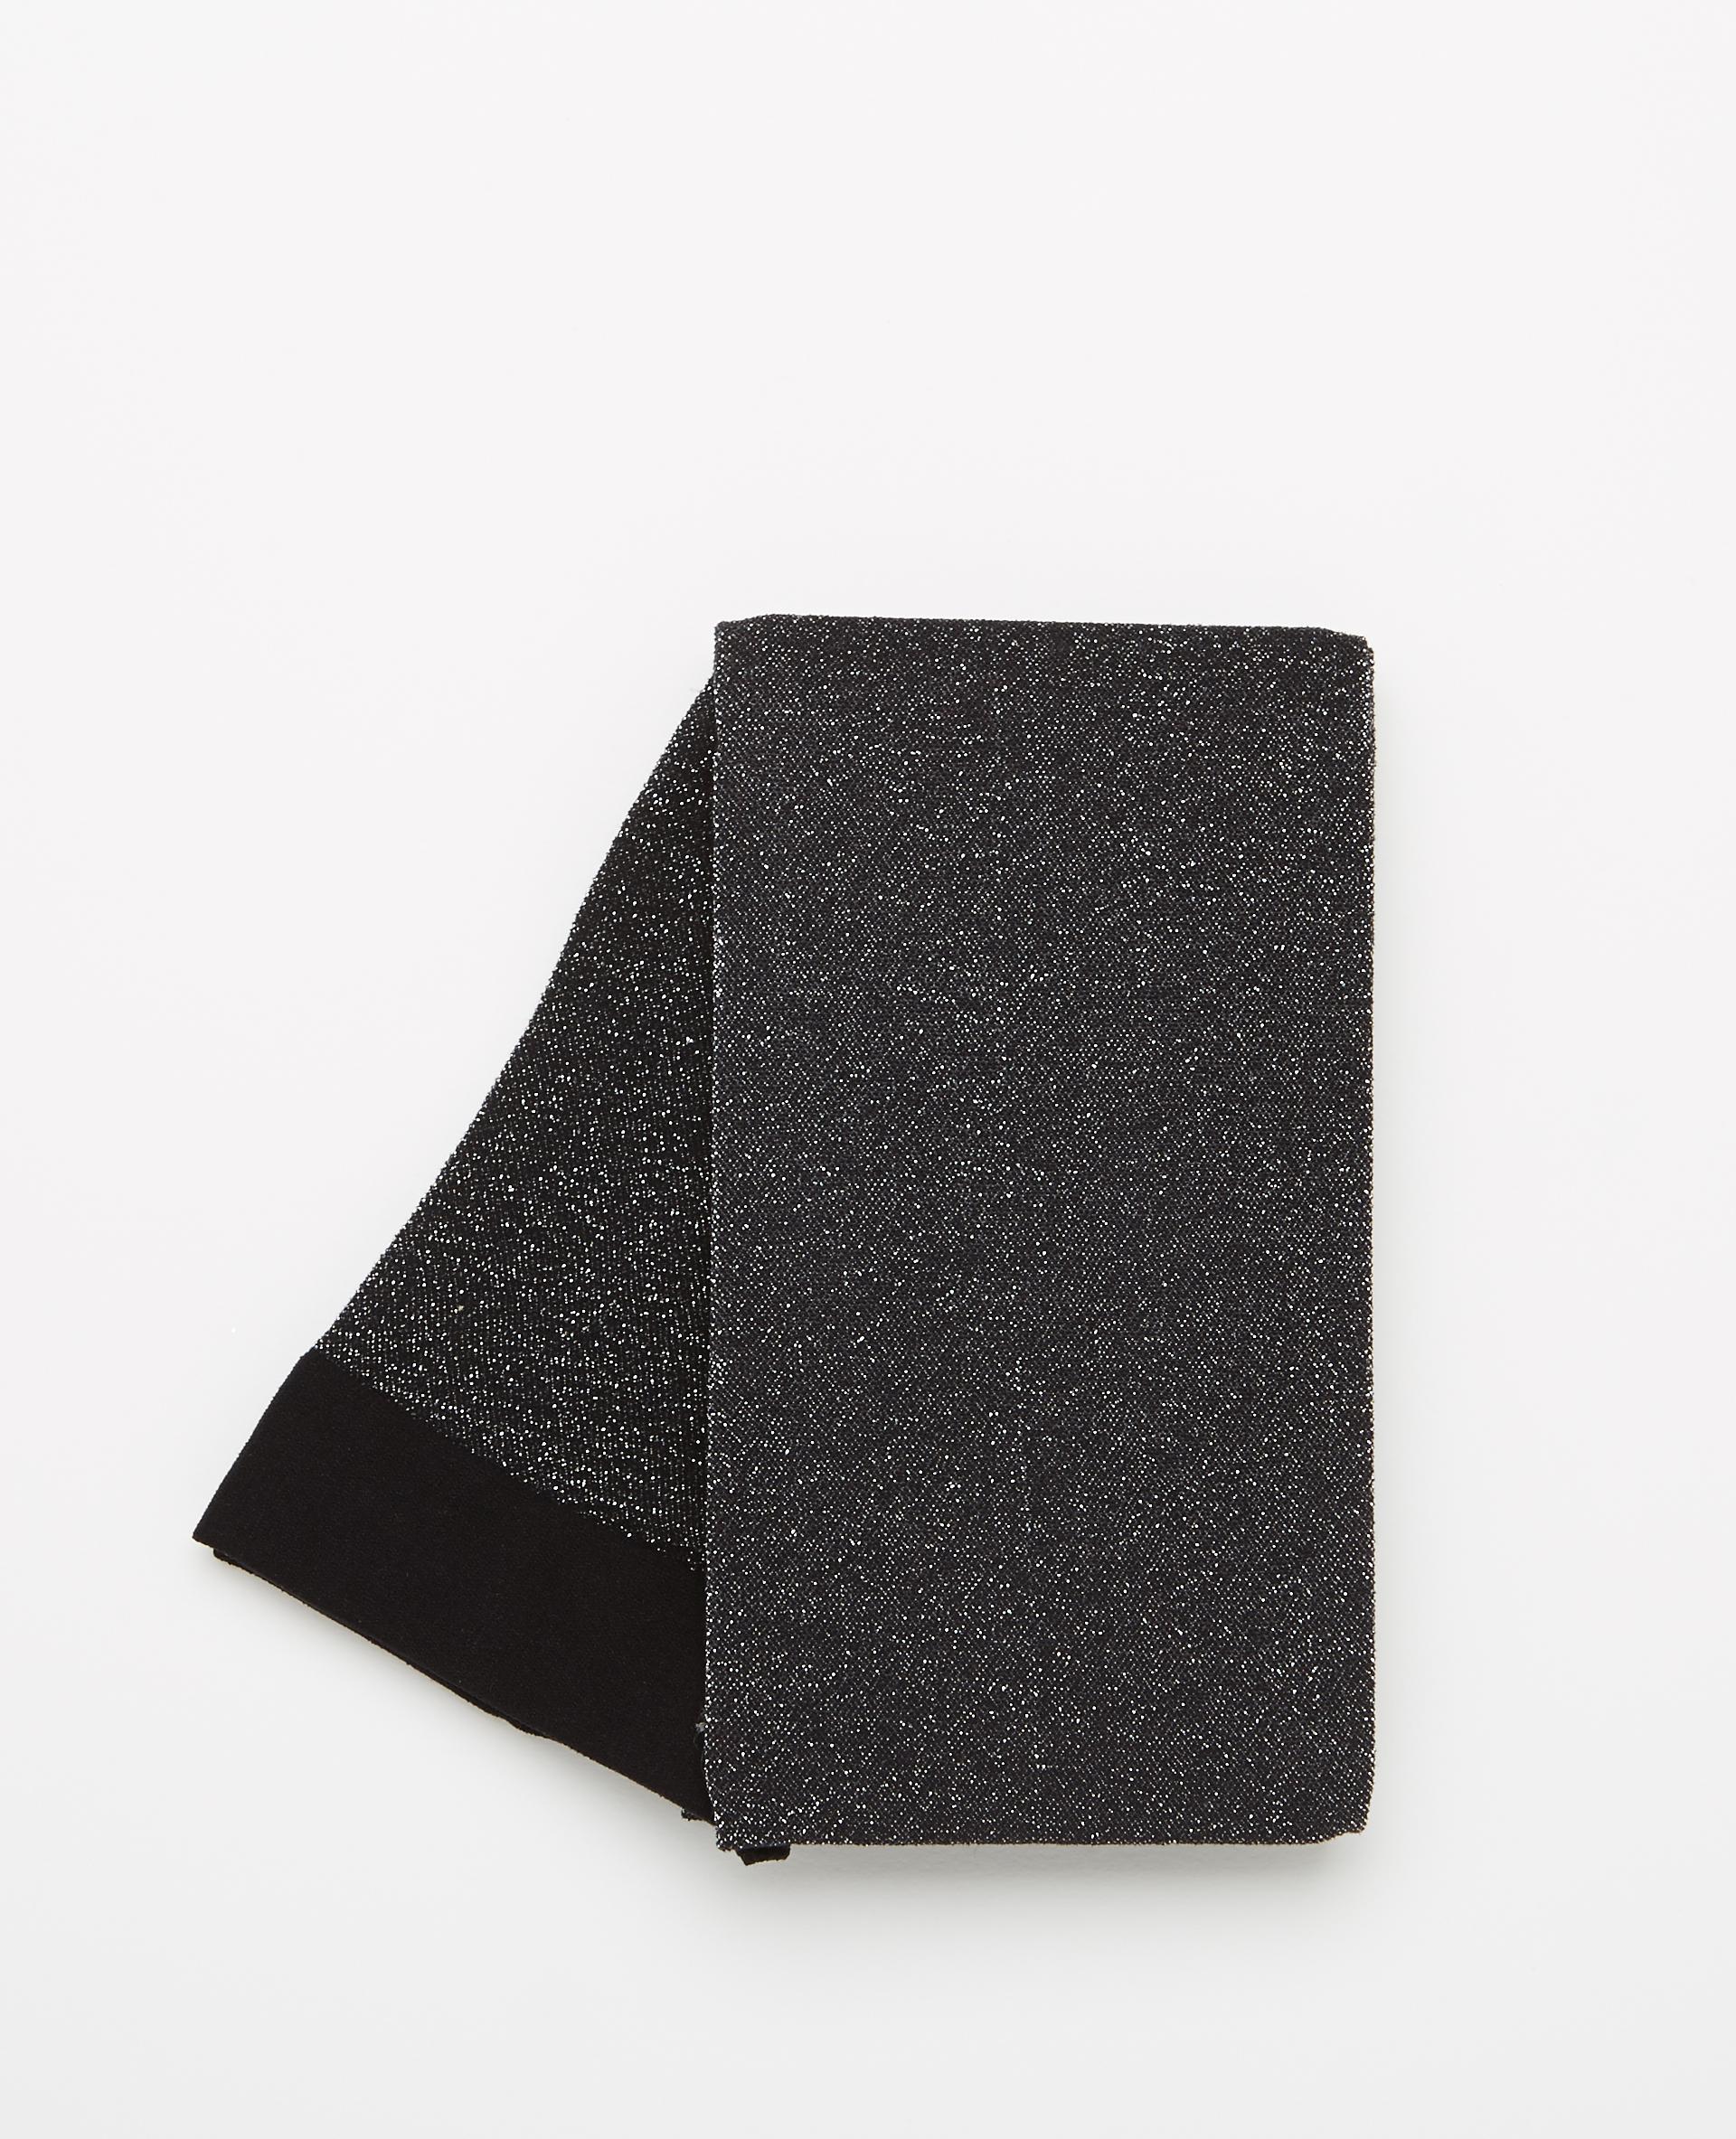 Collants lurex noir - Pimkie